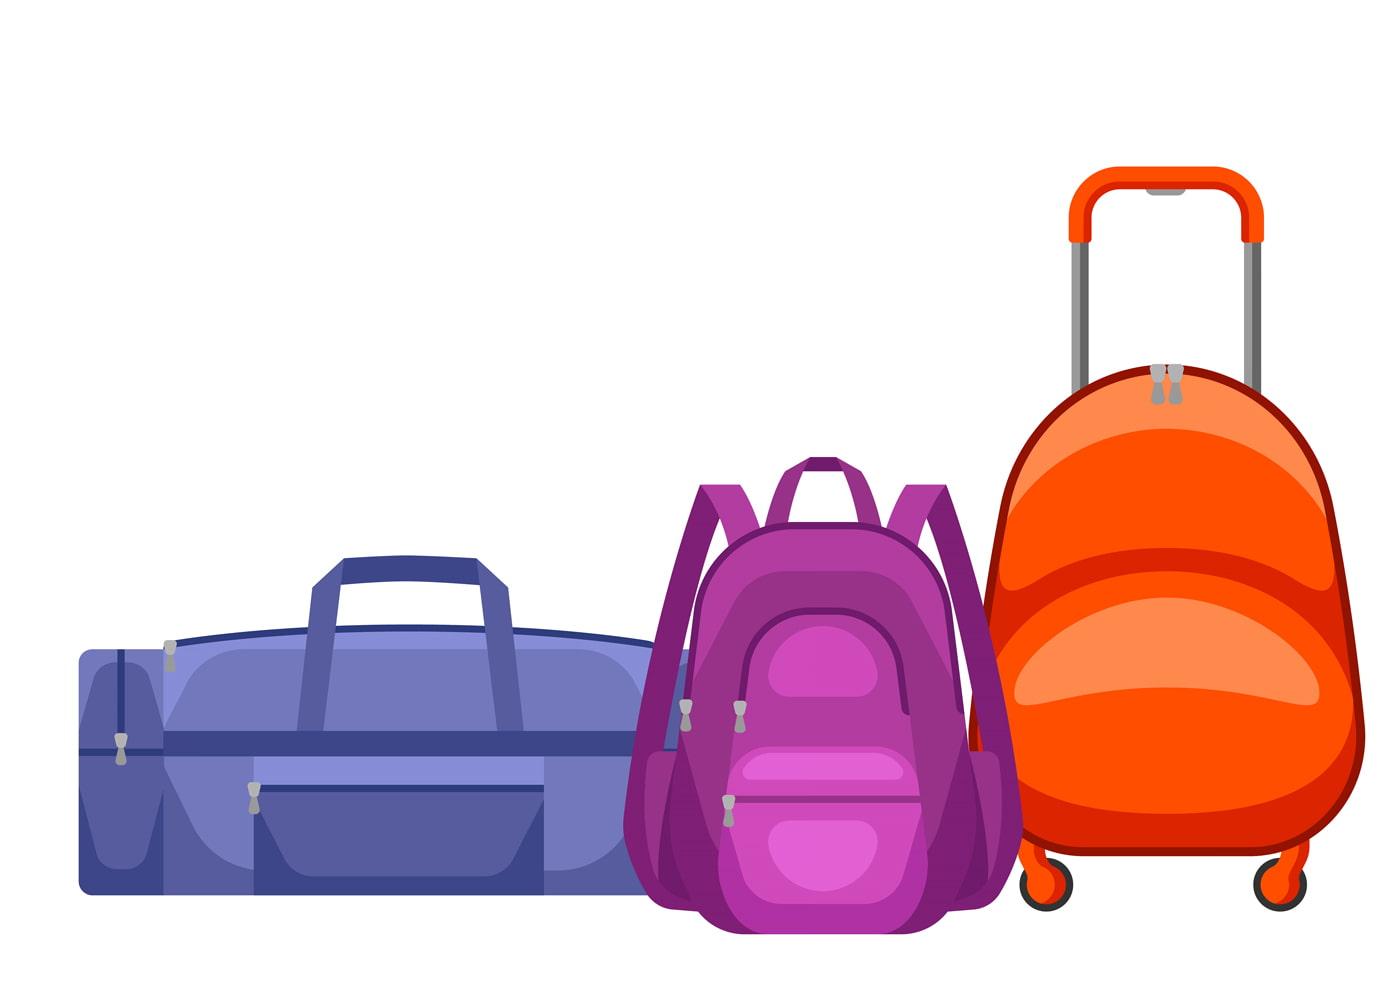 Backpack vs. Duffel vs. Rolling Suitcase